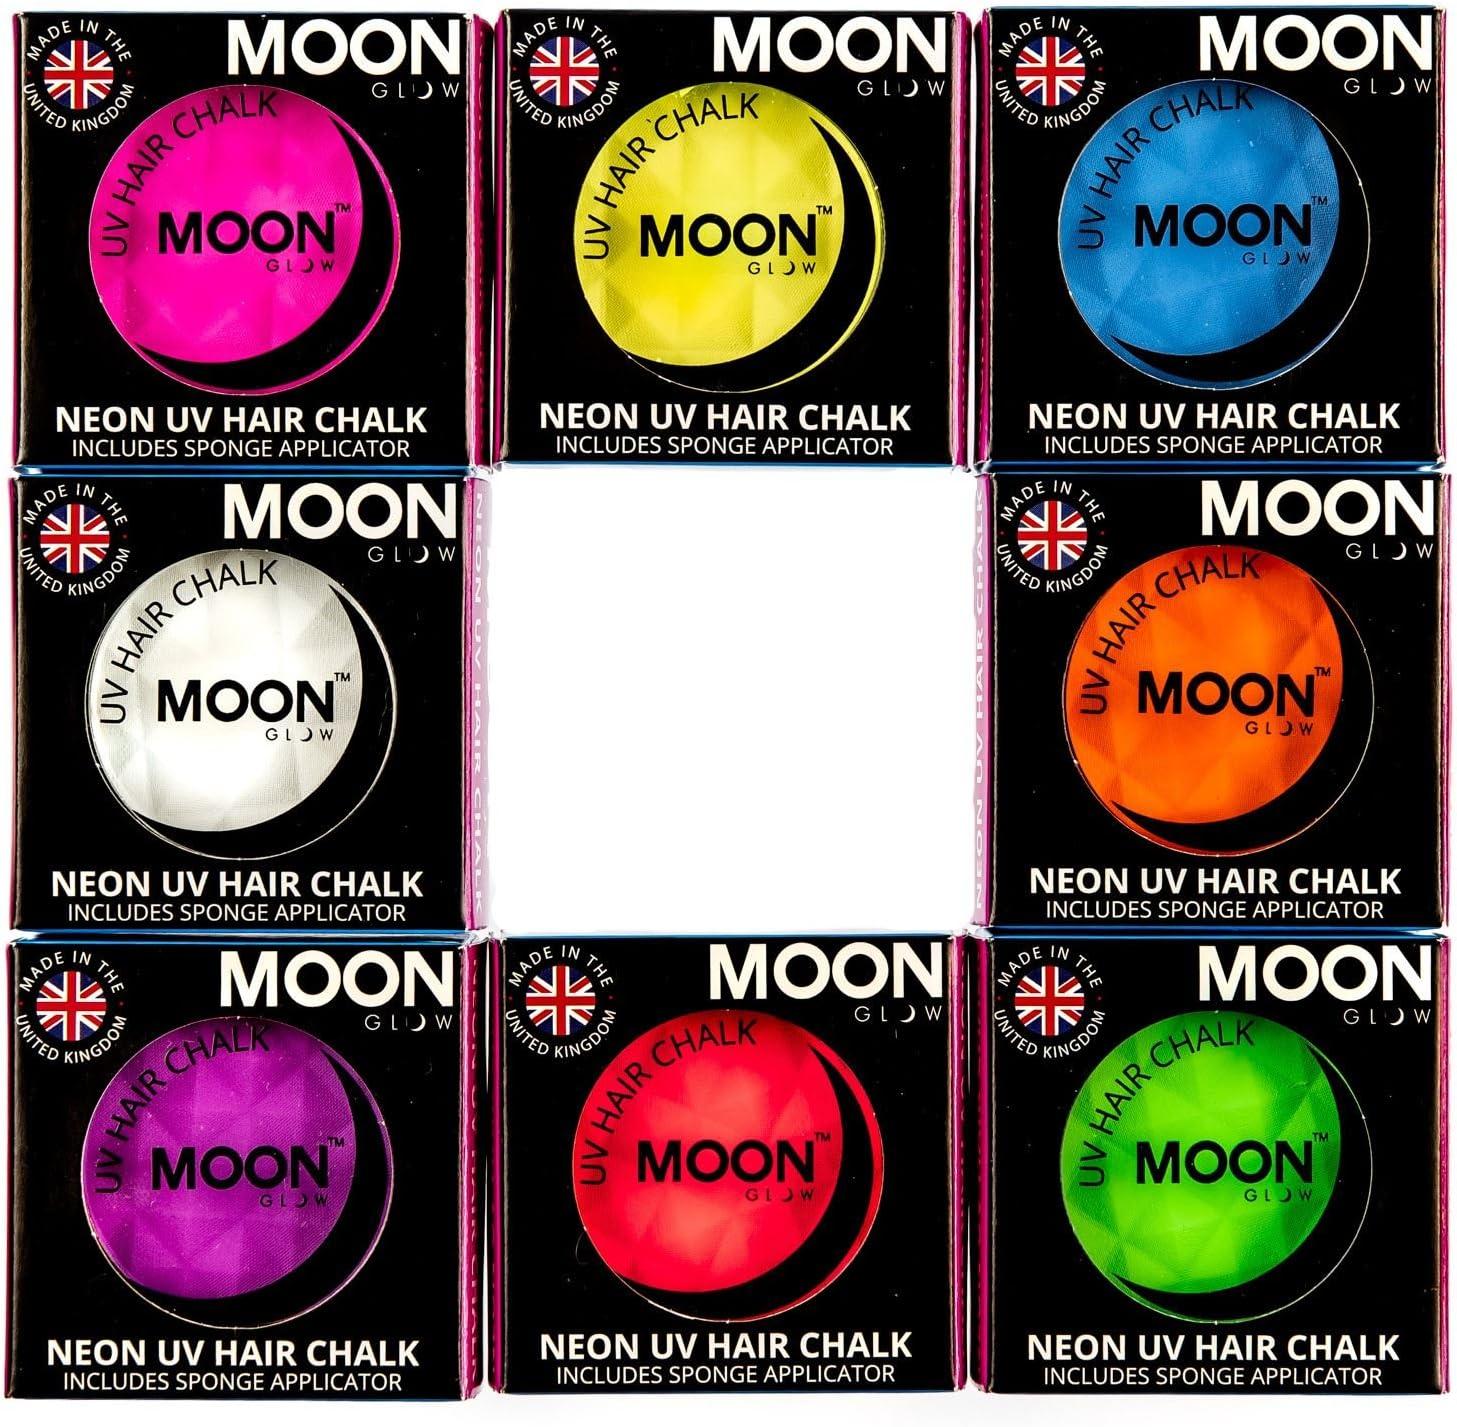 Moon Glow - Tiza para cabello UV de neón 3.5g Set de 8 colores - produce un brillo increíble bajo la iluminación/retroiluminación UV!